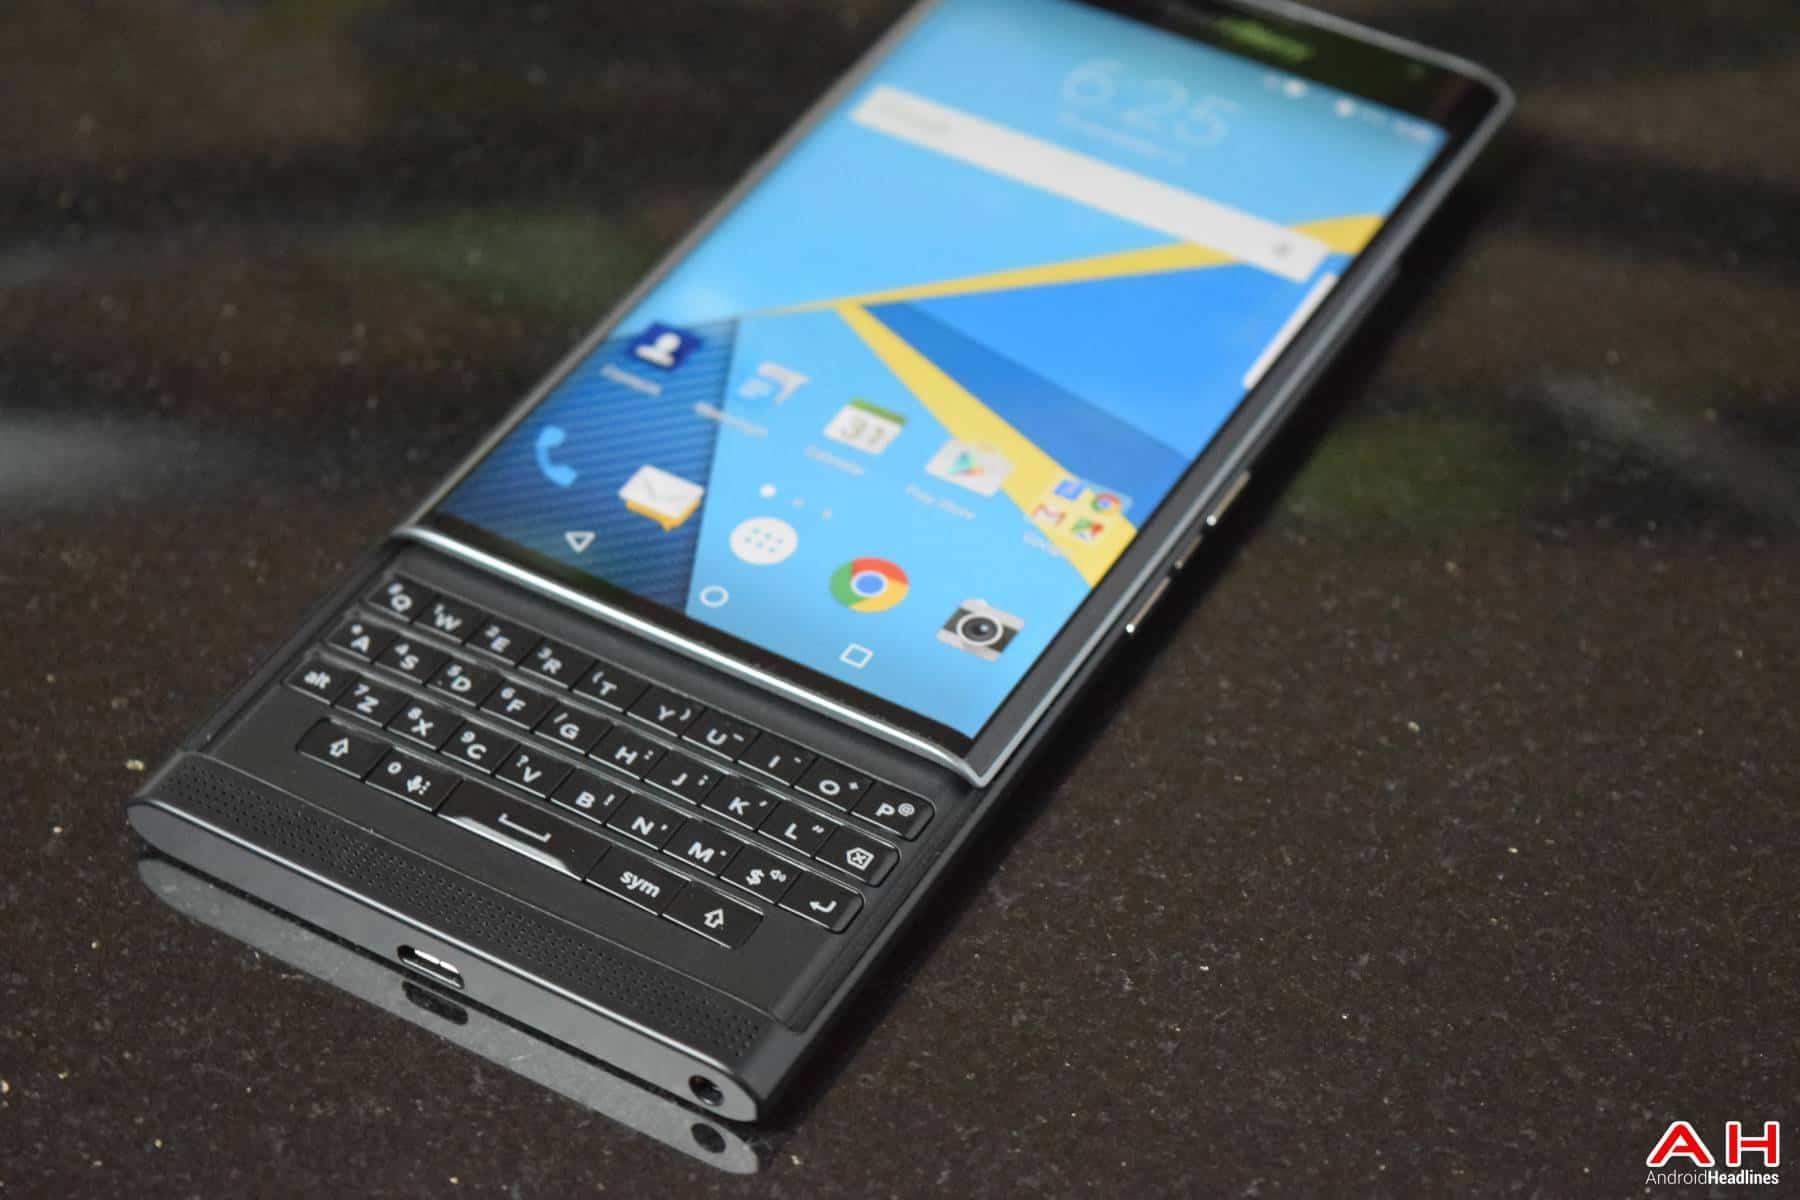 AH BB Blackberry Priv Qwerty Keyboard 2016 Chris -25